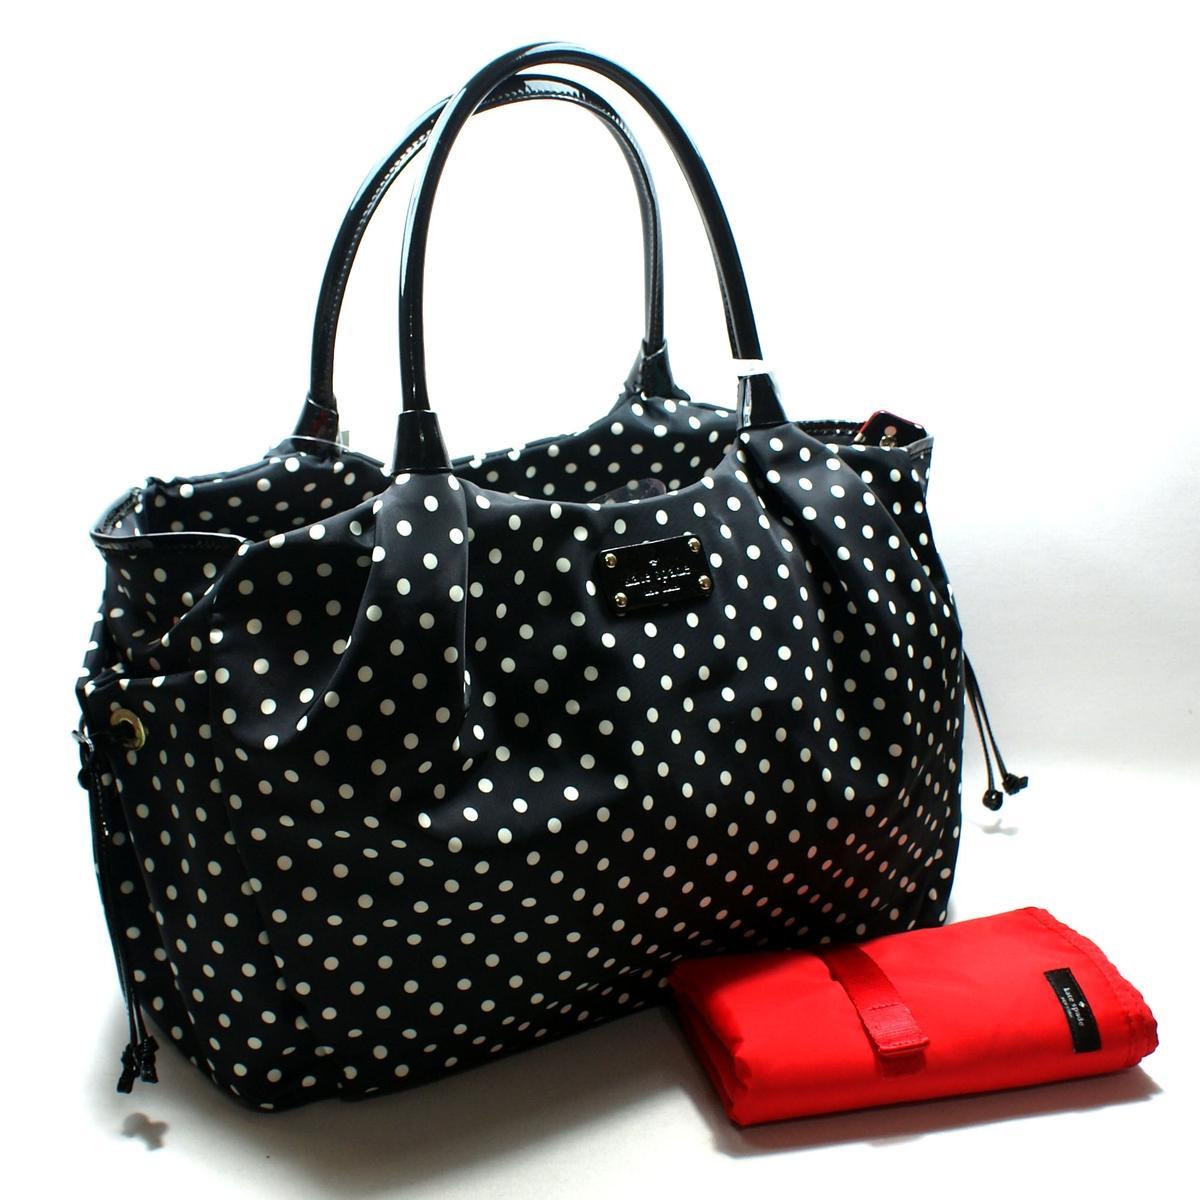 kate spade stevie baby bag spot nylon black diaper bag. Black Bedroom Furniture Sets. Home Design Ideas